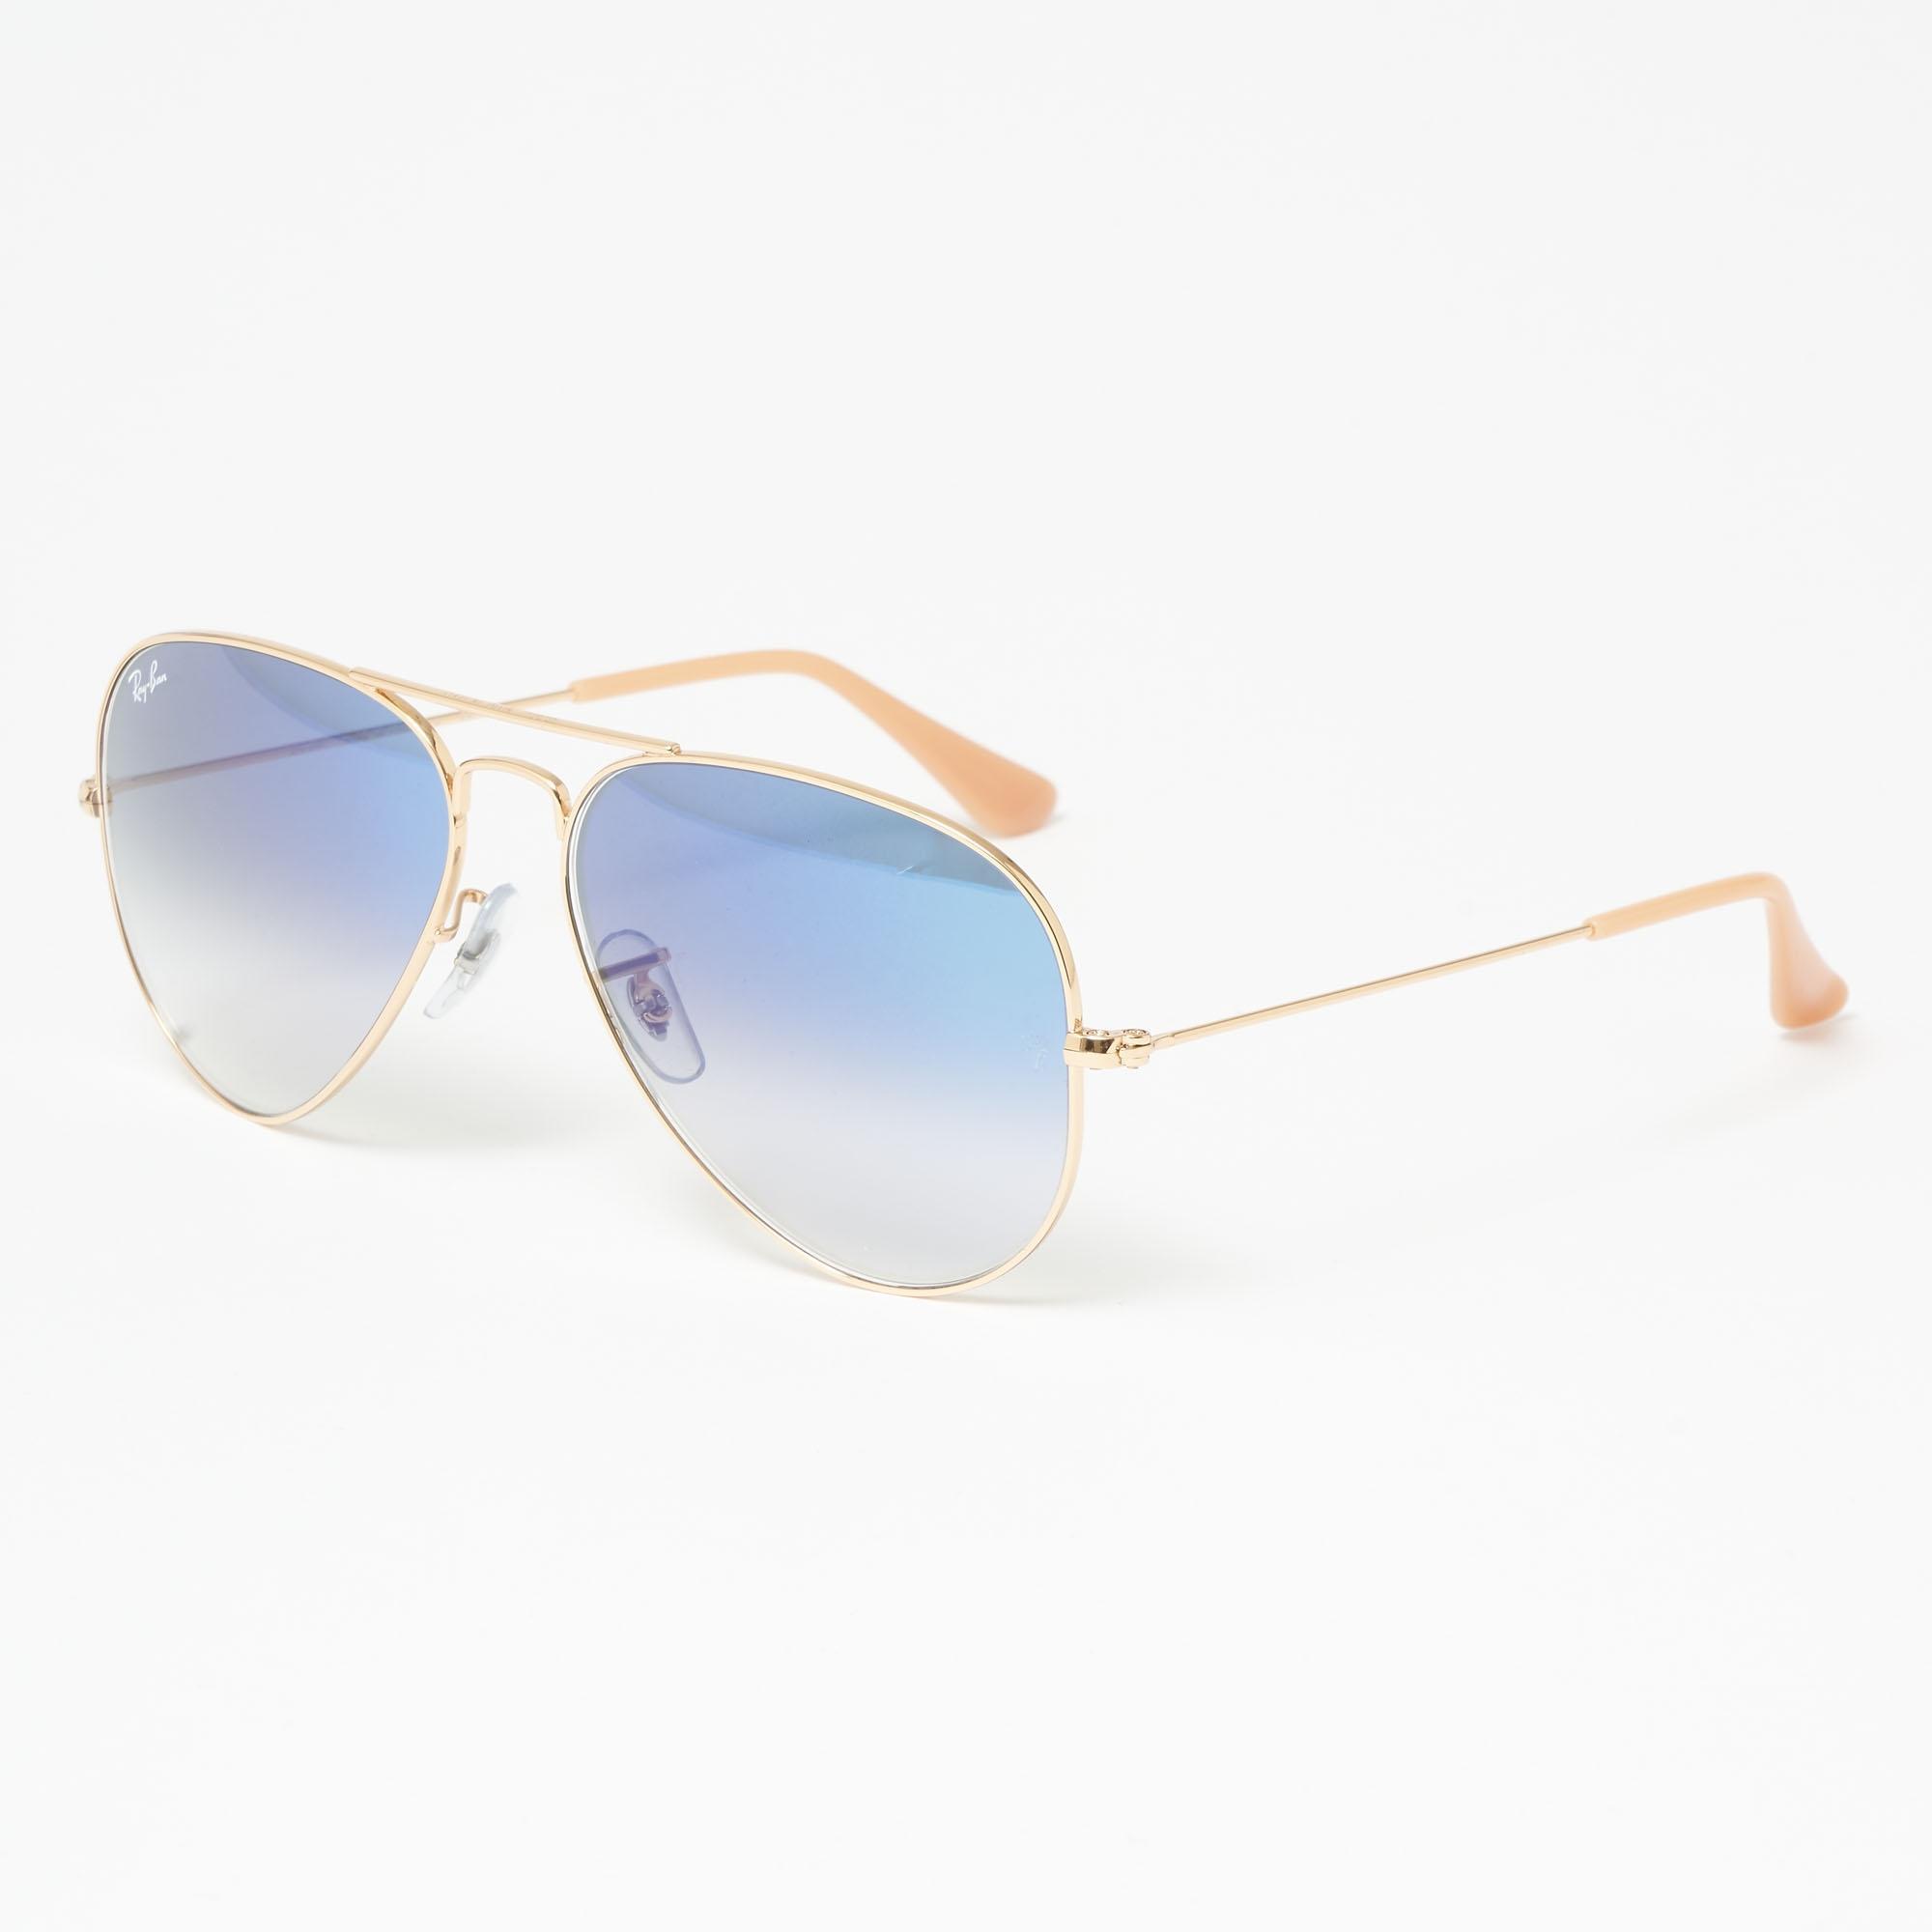 c1a84de1d7 Ray-Ban. Men's Aviator Gradient Sunglasses - Light Blue Gradient Lenses